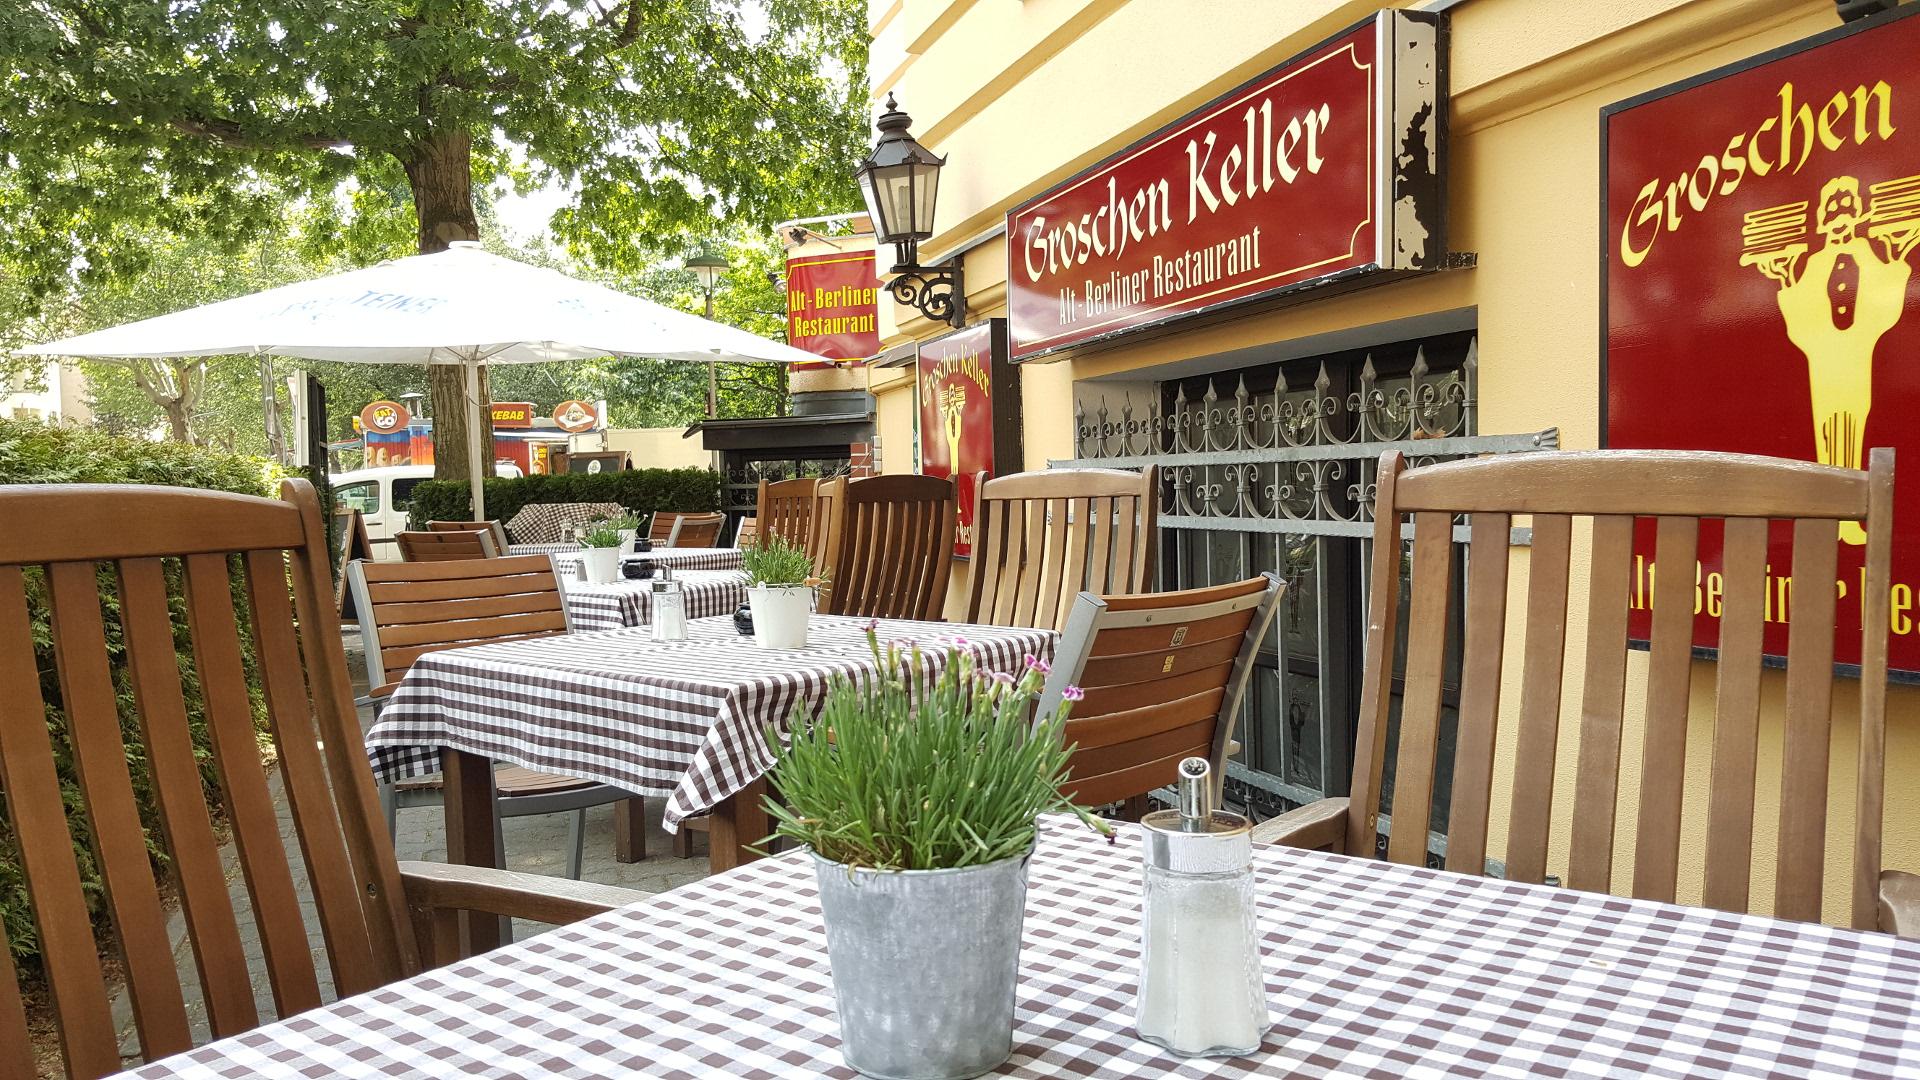 Groschen Keller